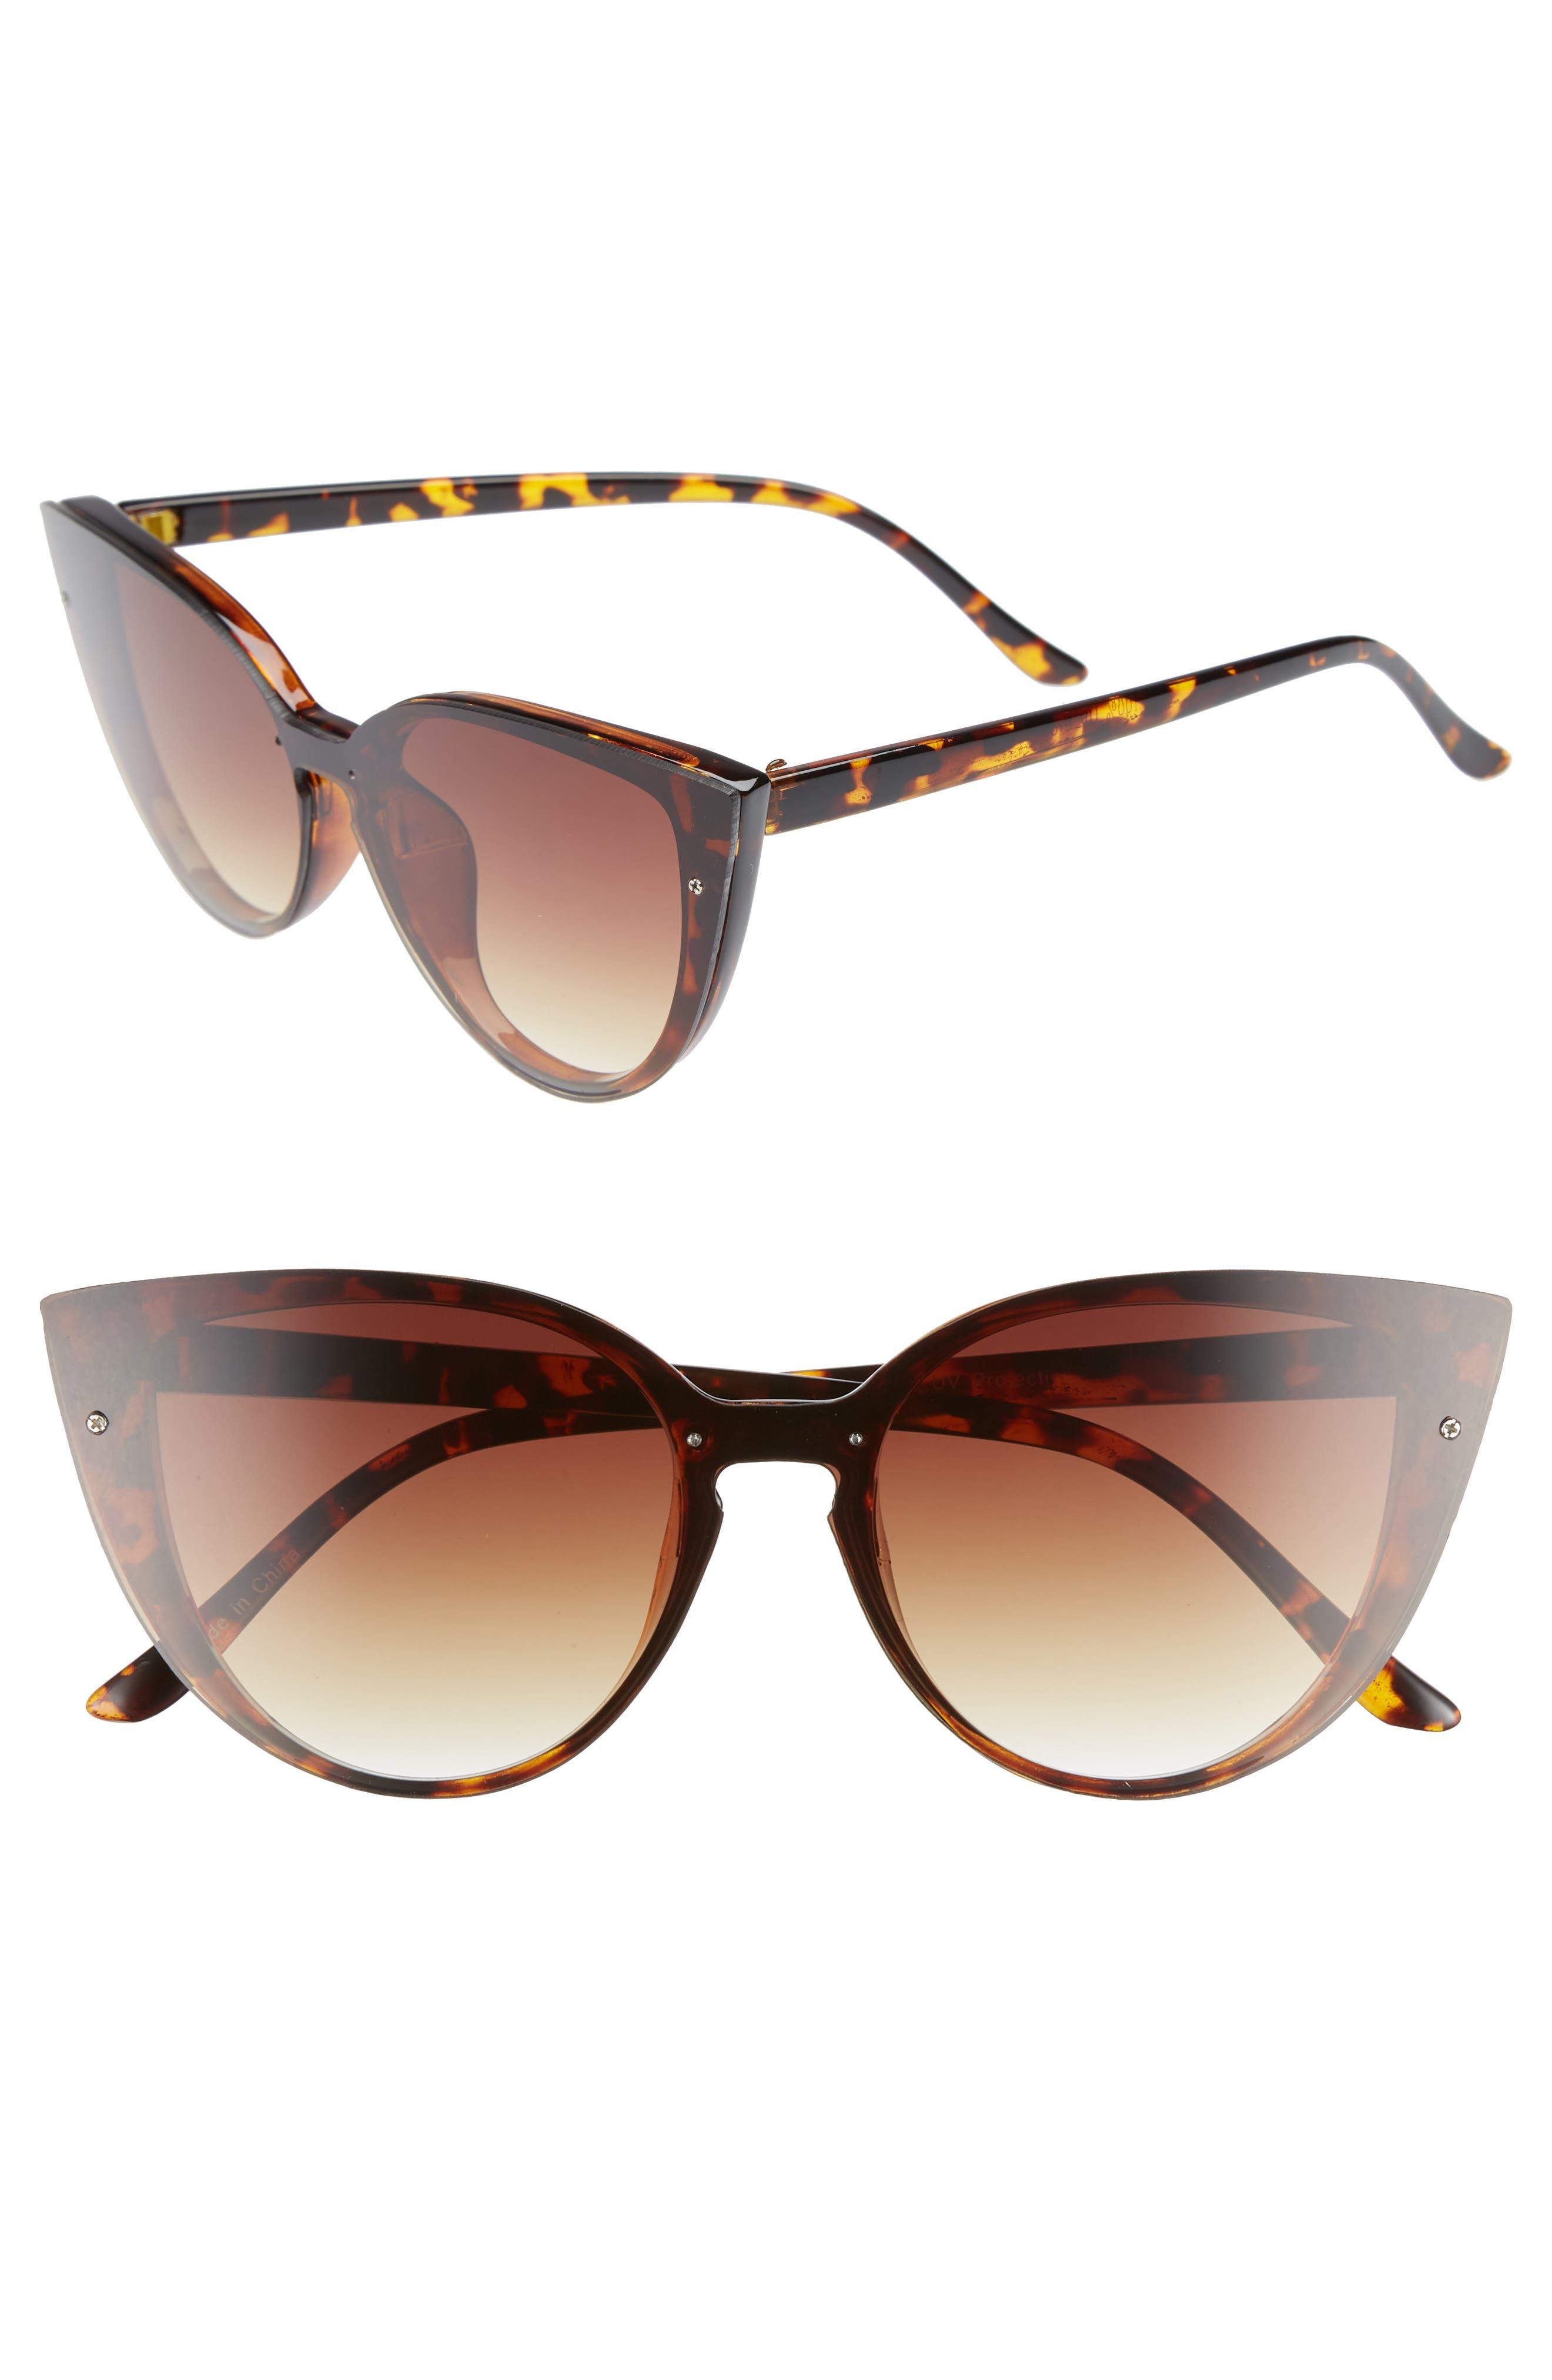 52mm Flat Cat Eye Sunglasses,                         Main,                         color, 200